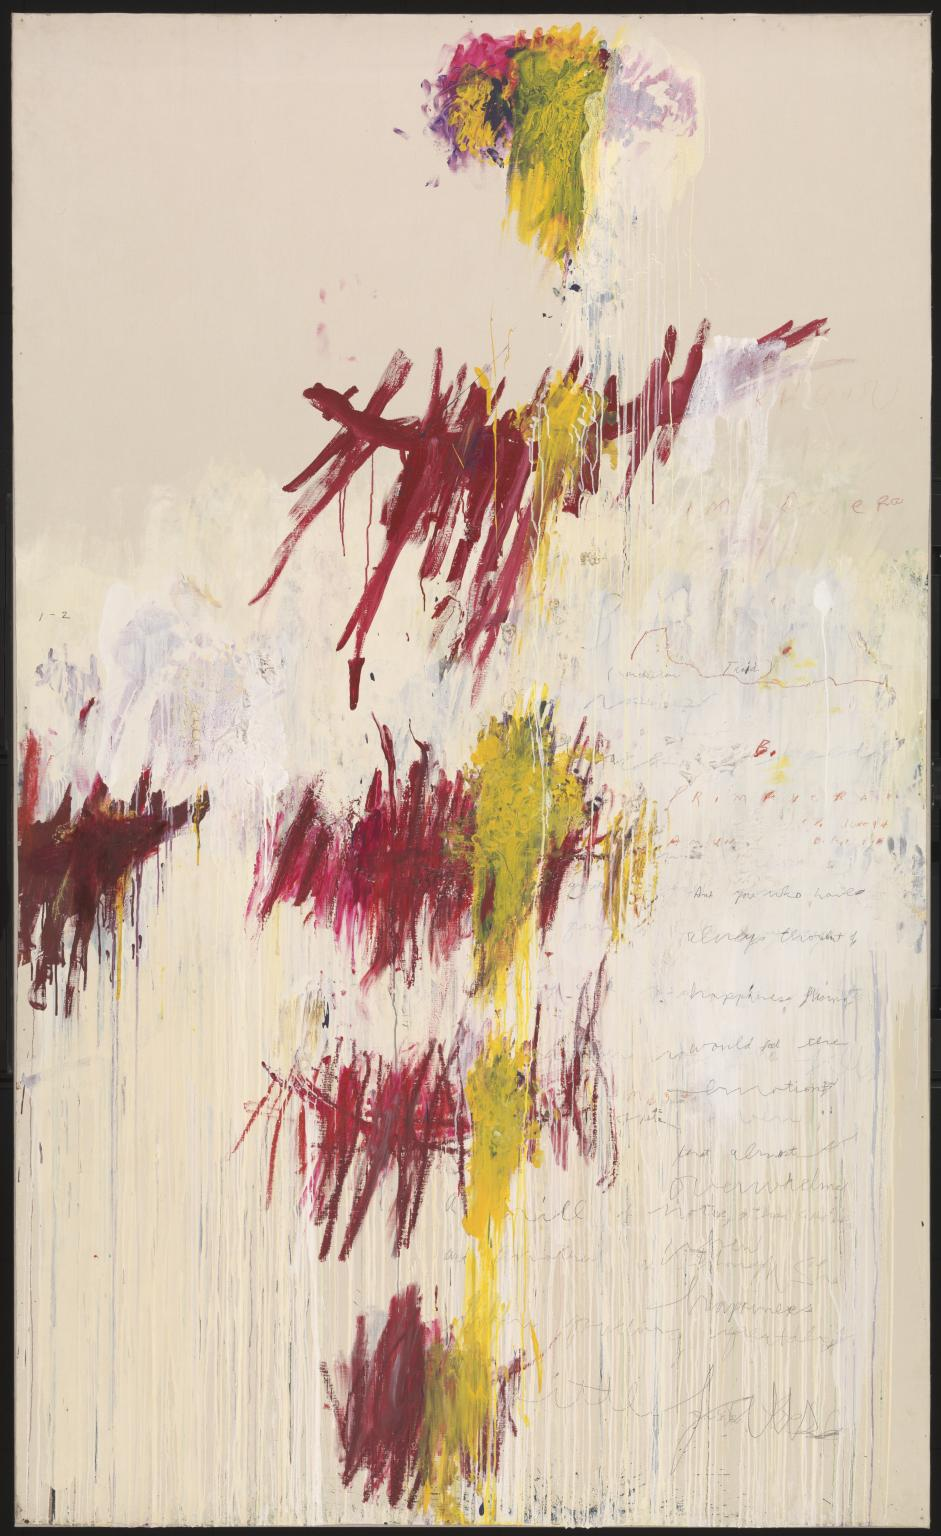 Quattro Stagioni: Primavera 1993-5 by Cy Twombly 1928-2011